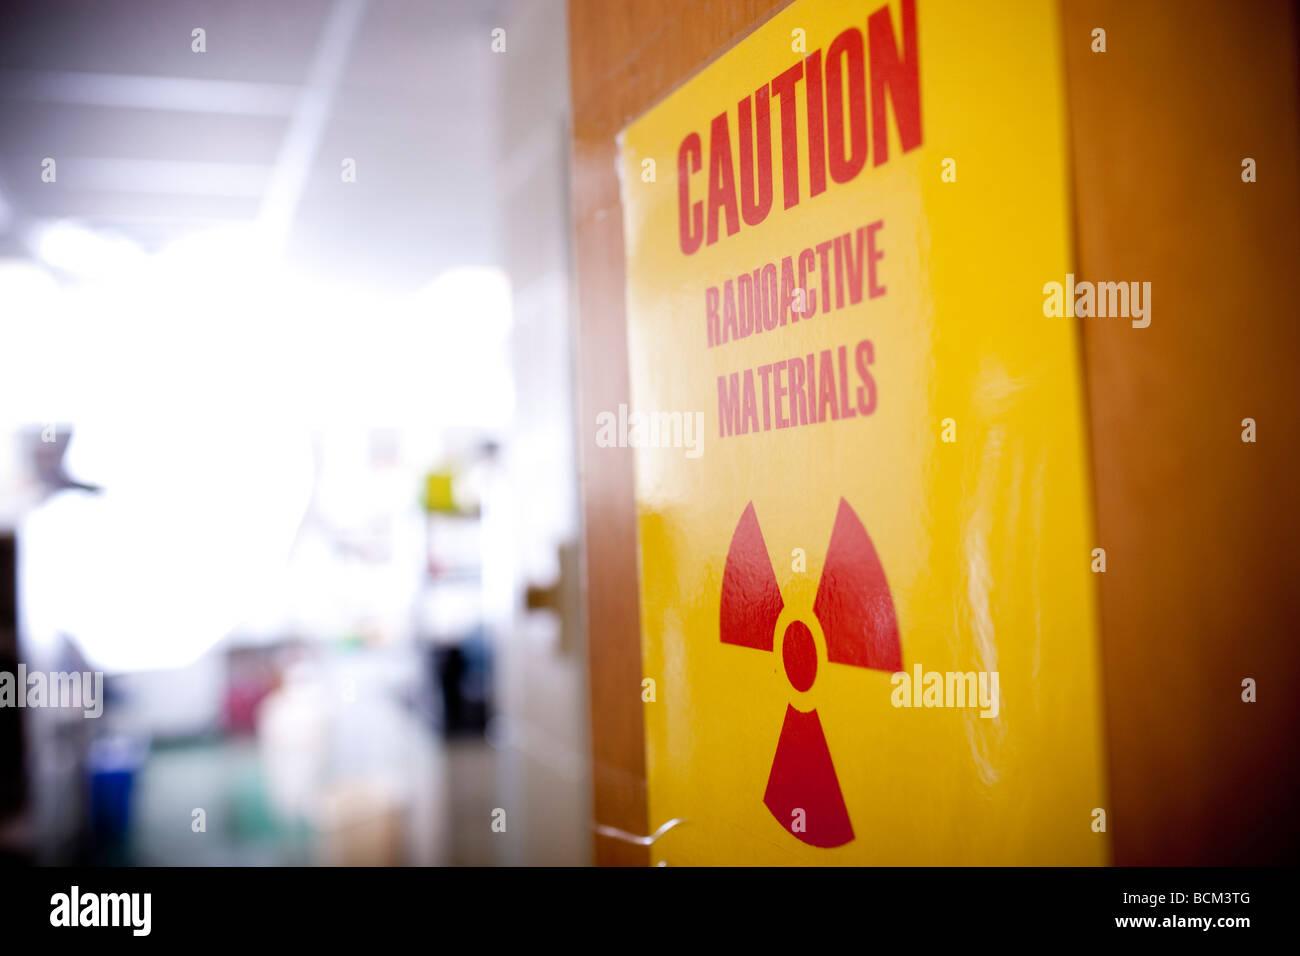 Caution Radioactive Materials sign on classroom doorway - Stock Image